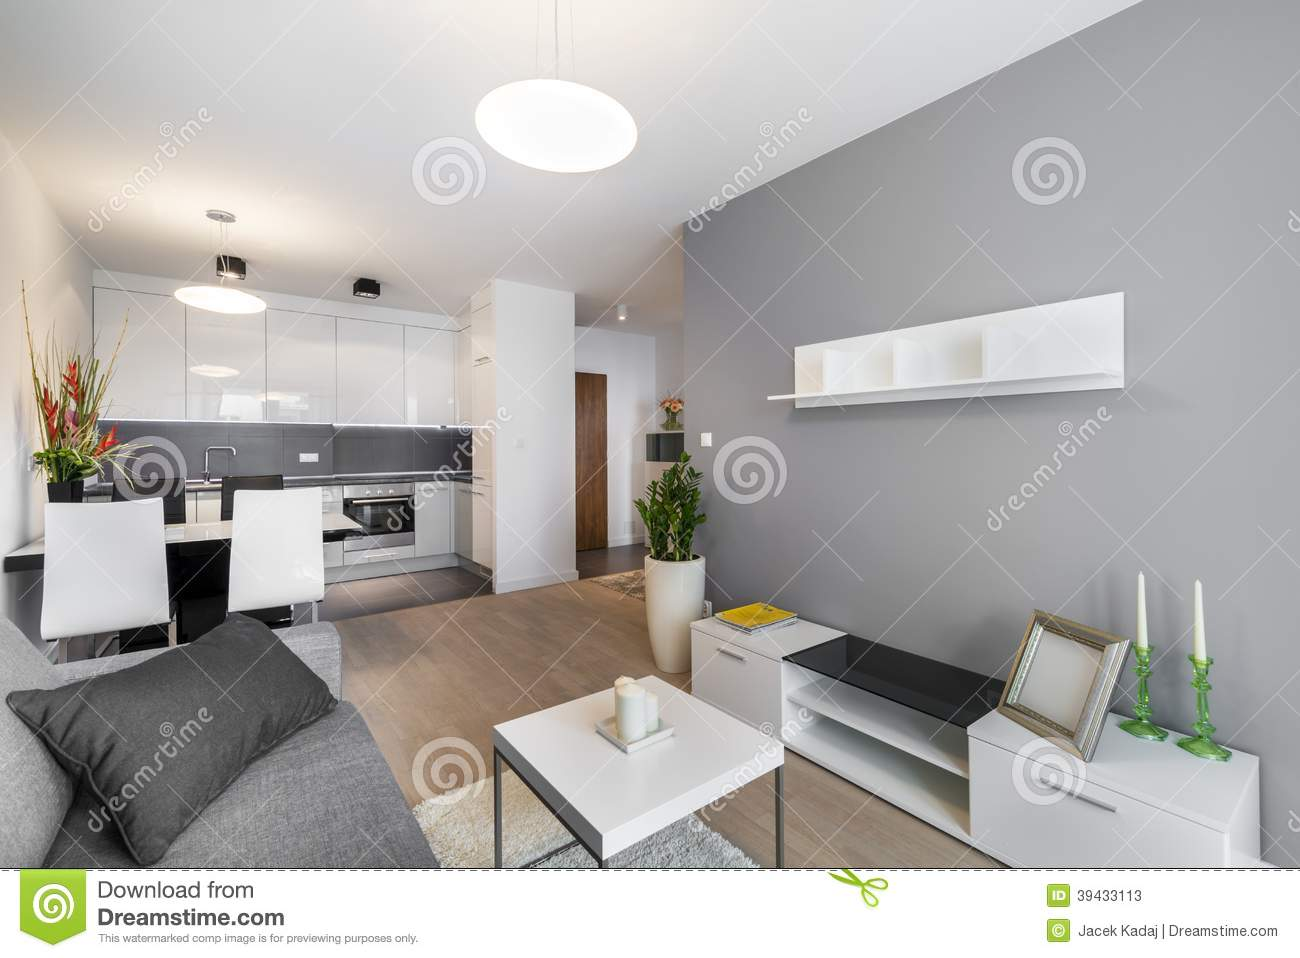 modern interior design living room stock image - image of luxury